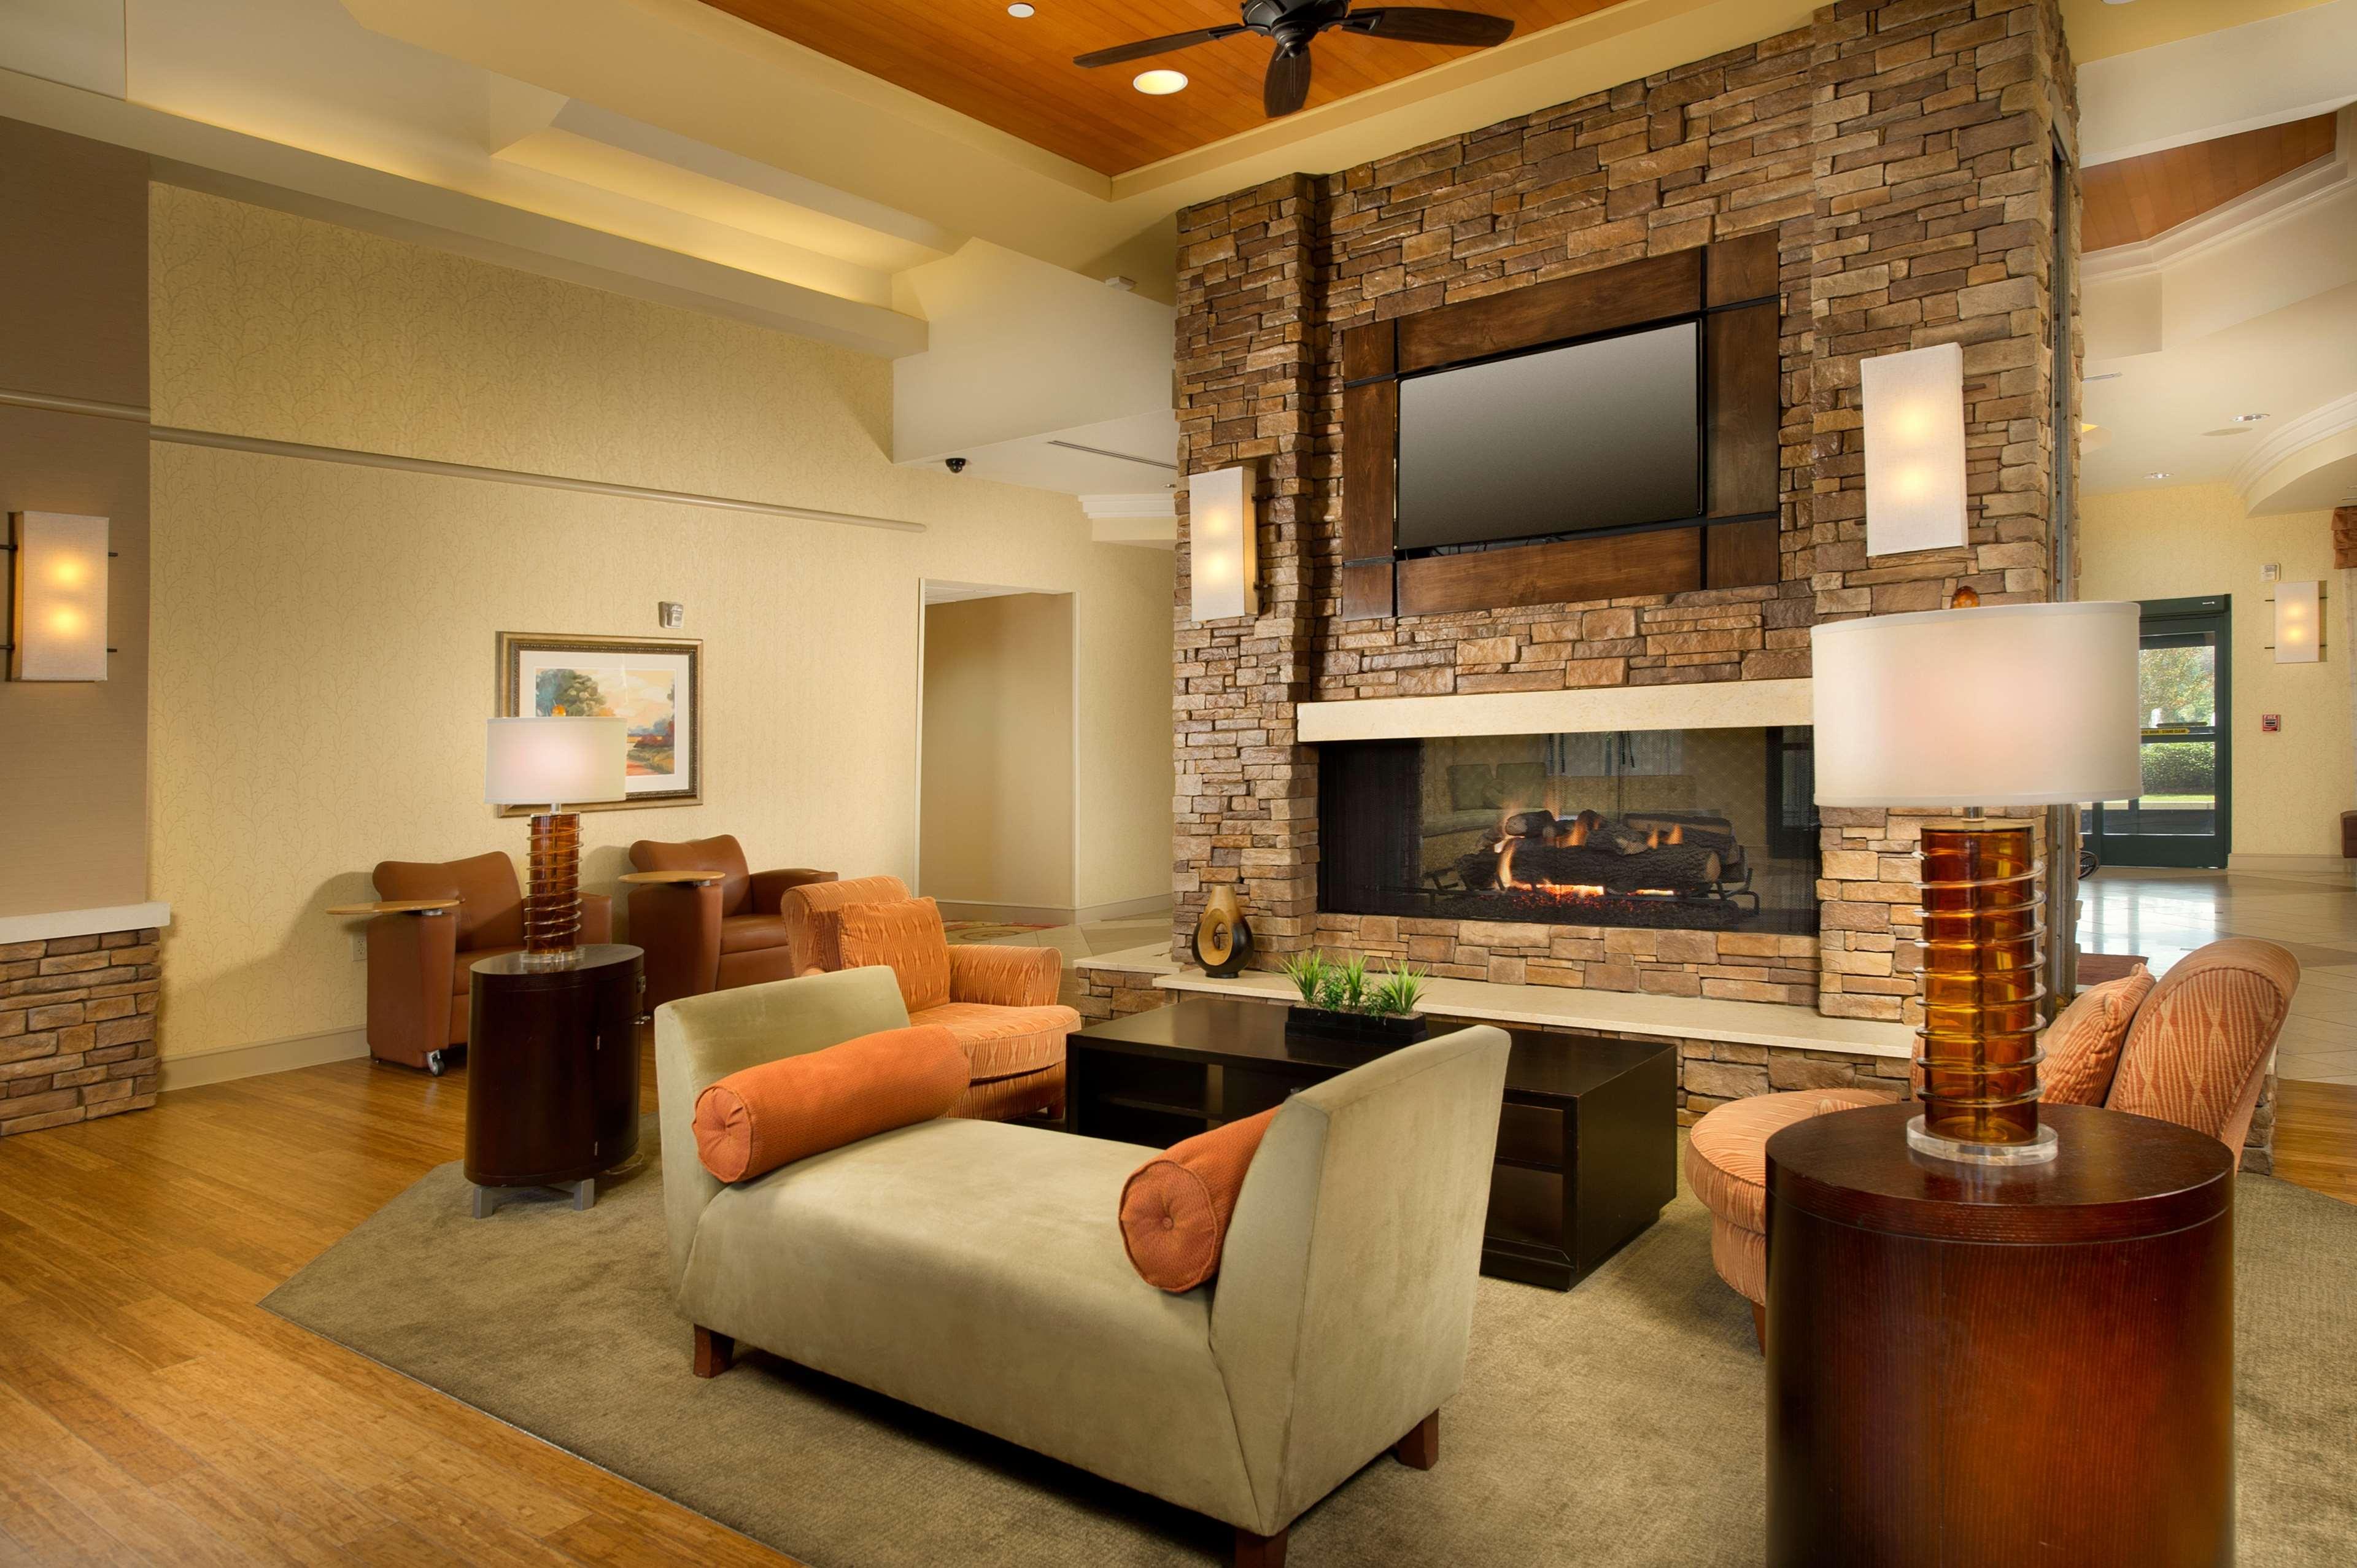 Homewood Suites by Hilton Columbus image 6